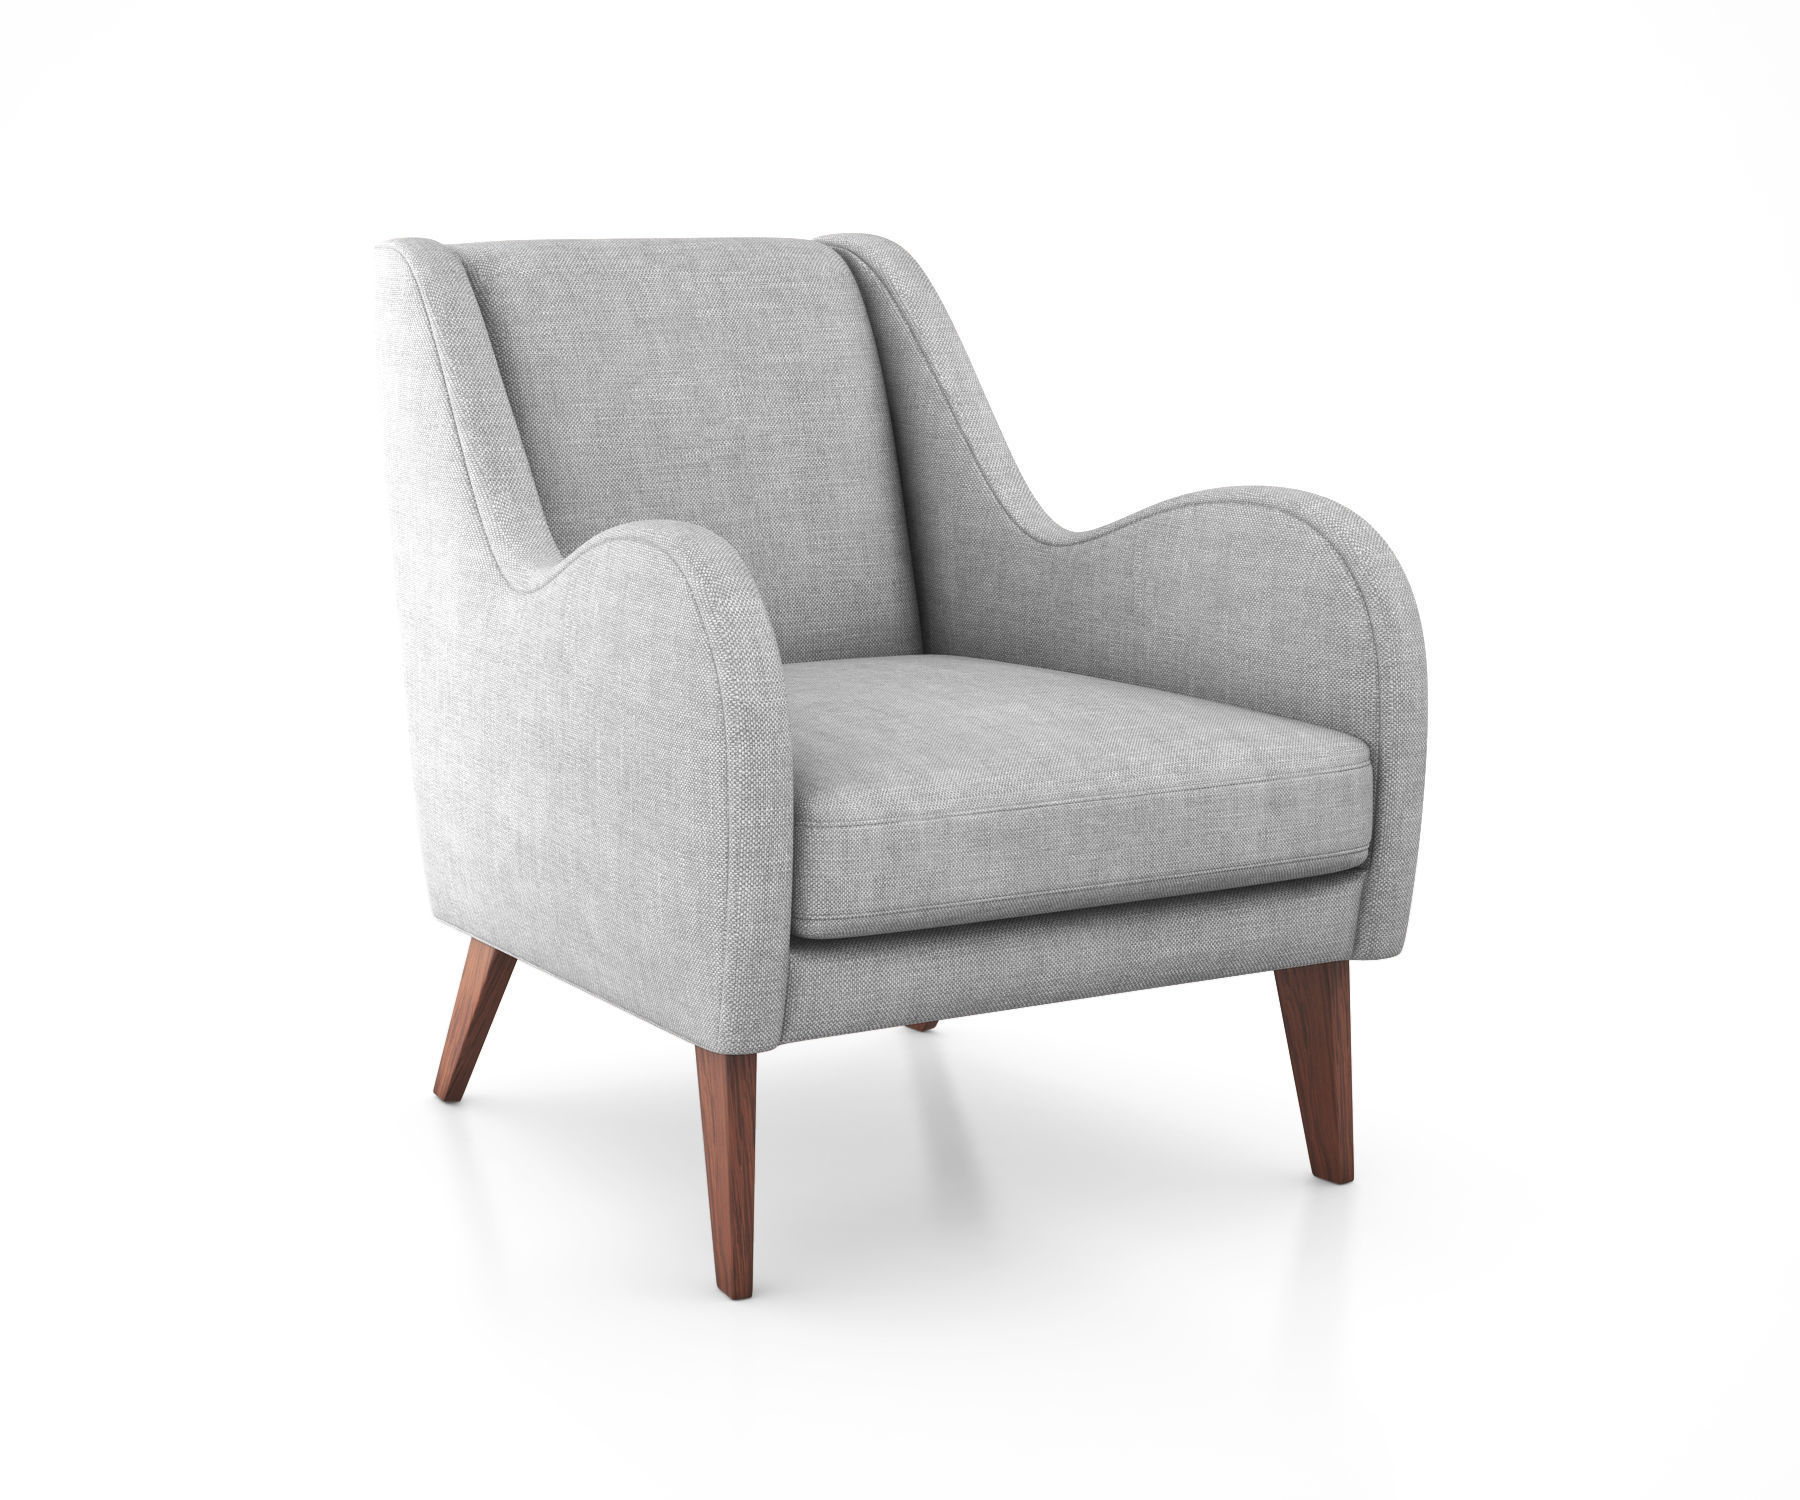 Sebastian Chair by West Elm